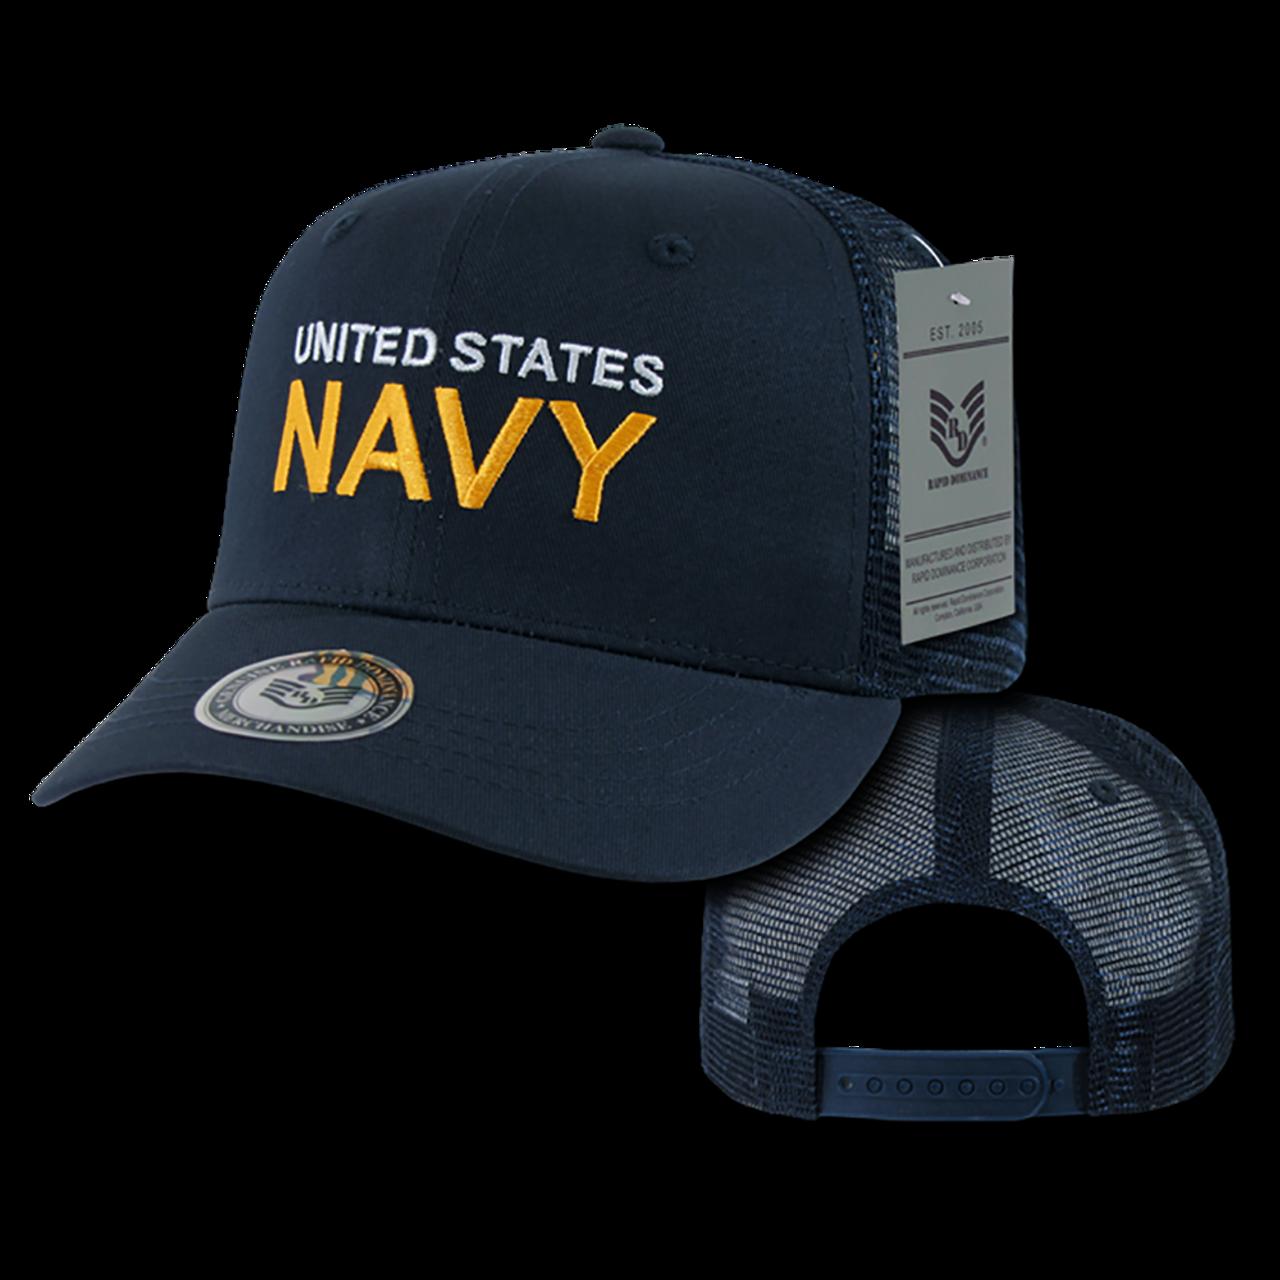 S77 - U.S. Navy Cap - Back to Basics - Trucker Mesh - Navy -  USMILITARYHATS.COM 18522926766